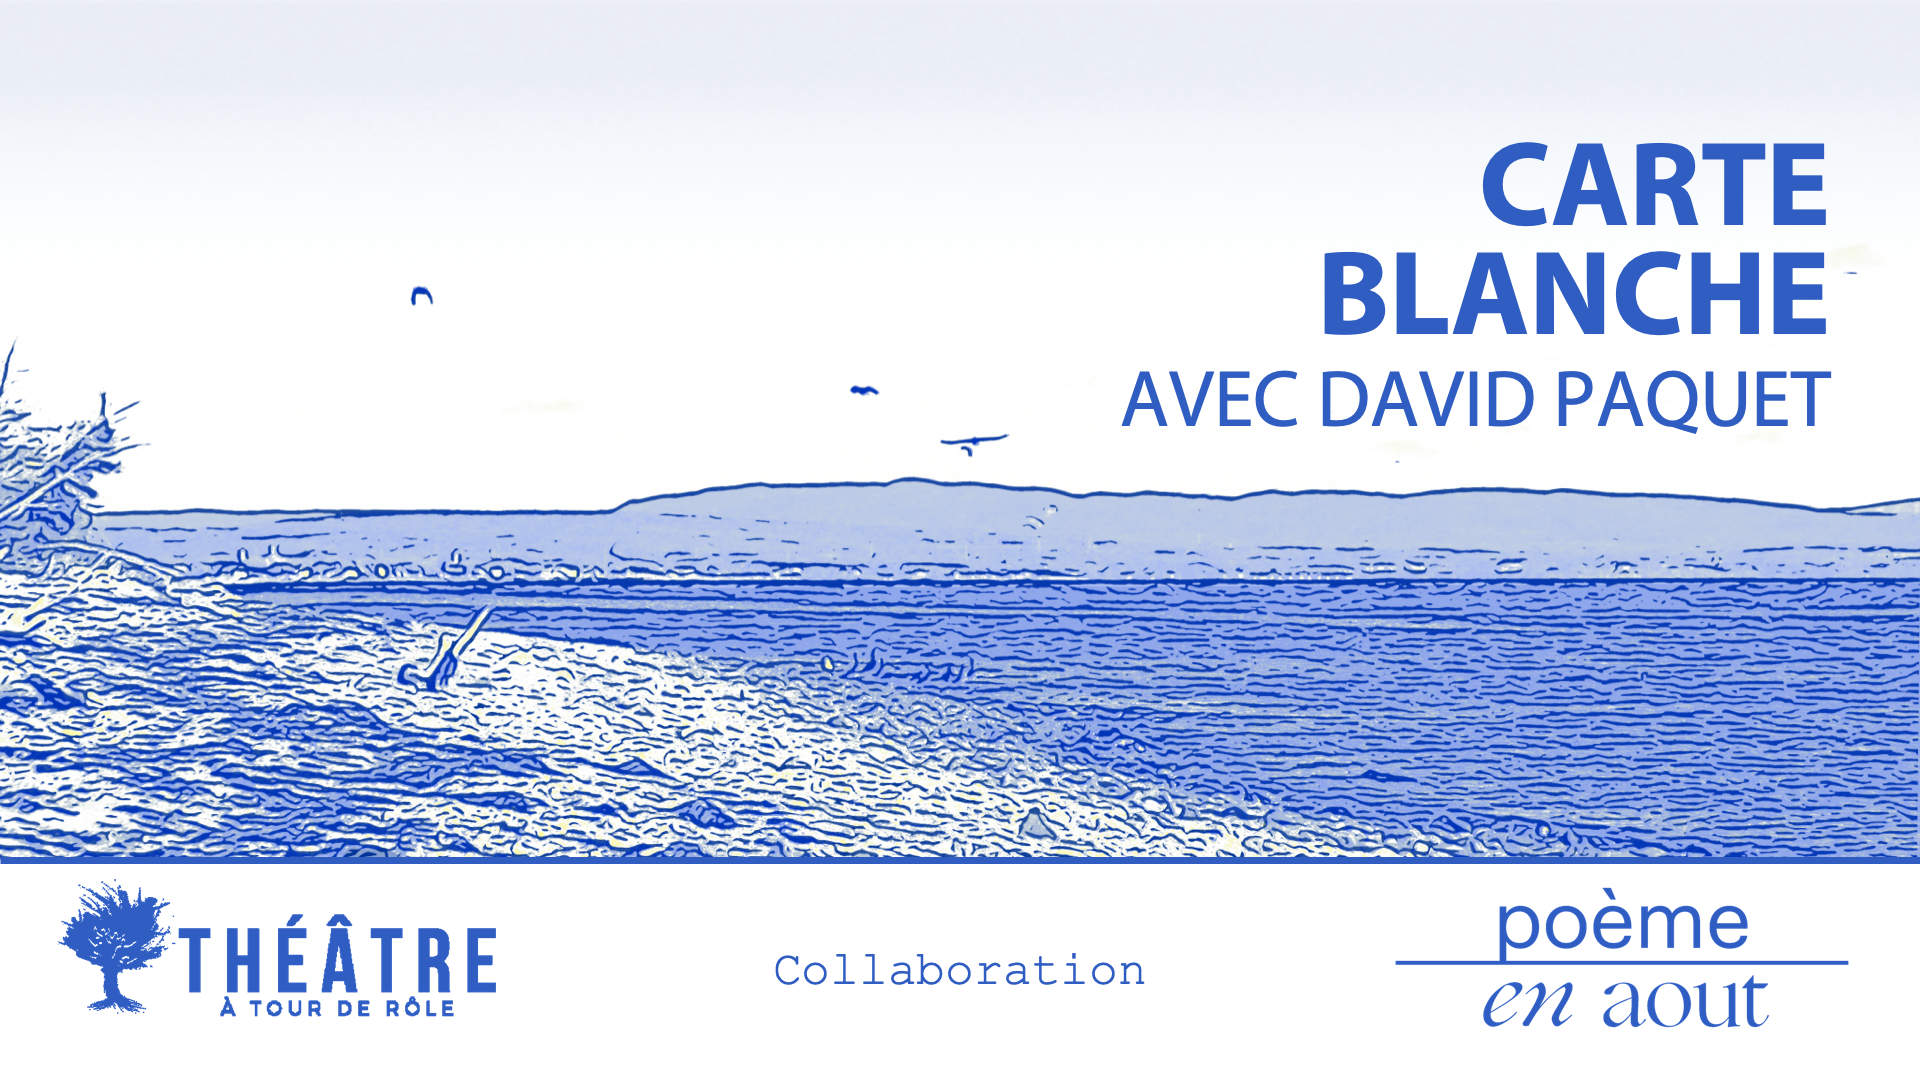 CARTE BLANCHE avec David Paquet